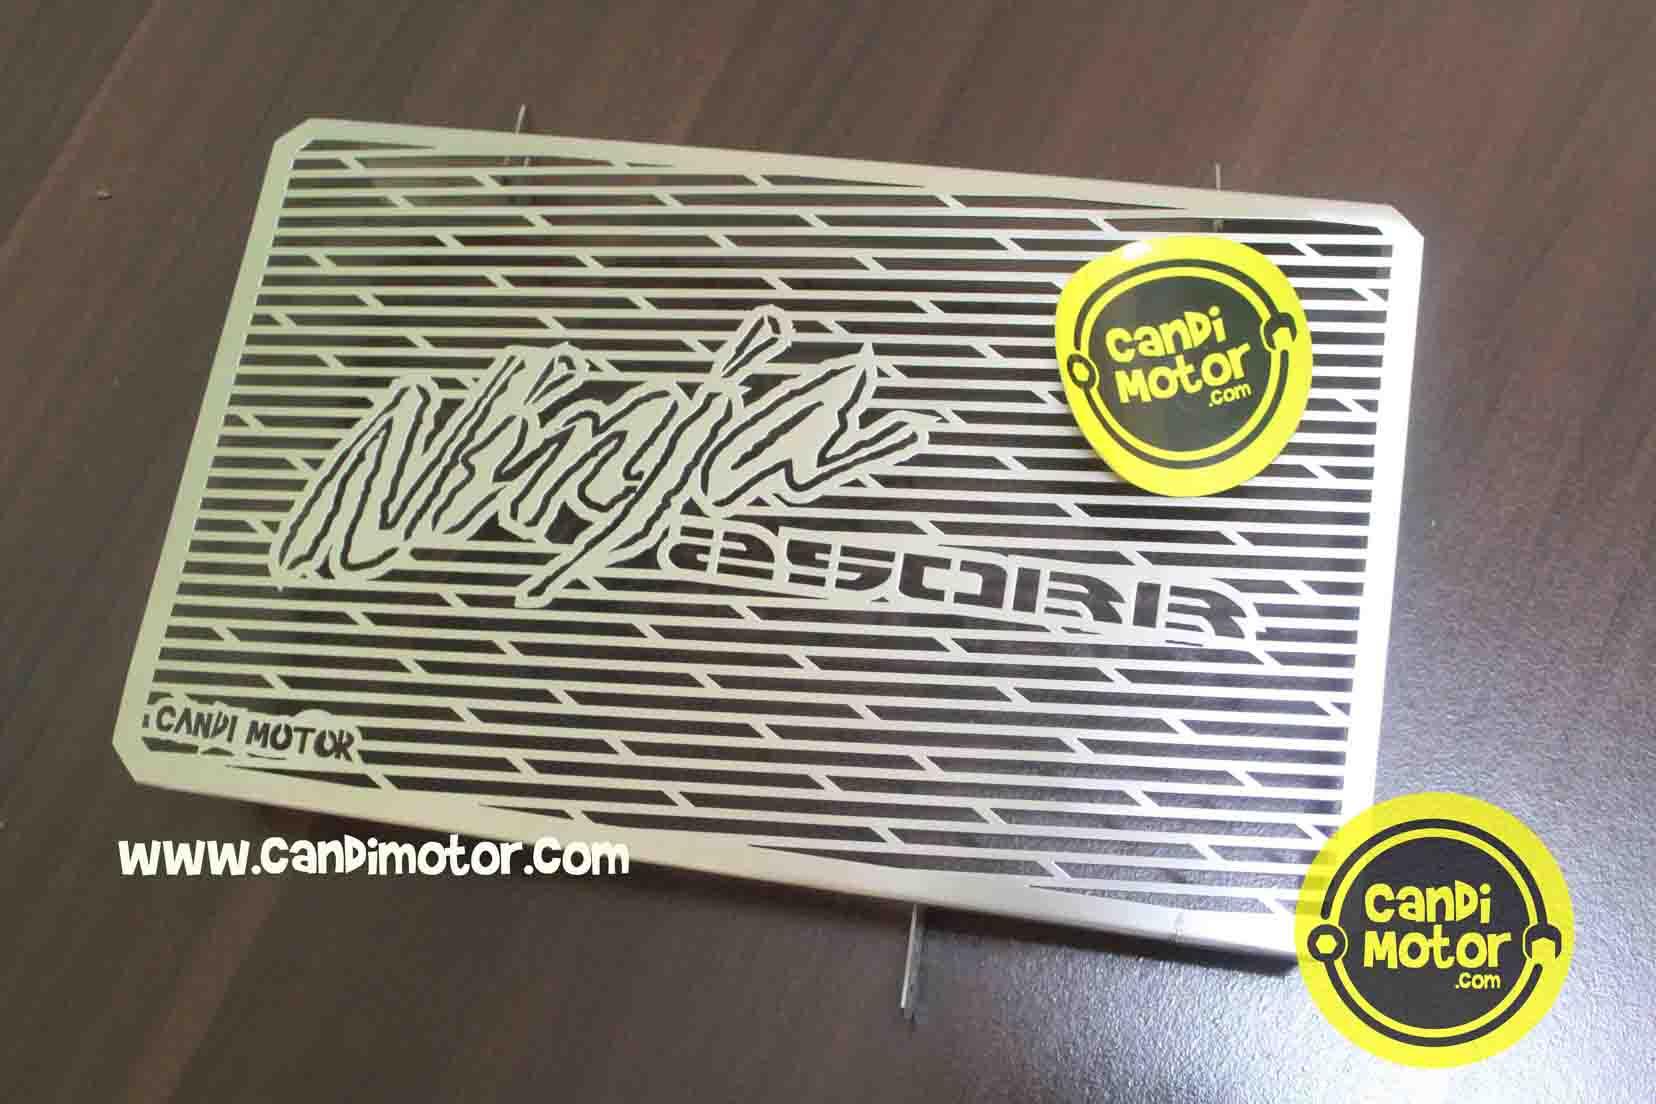 Aksesoris Variasi Candi Motor Cover Pelindung Radiator Grill Ninja Knalpot Prospeed Black Series 250 Rr Mono Z250sl Fullsystem Z250 Sl Ada Juga Untuk Fi Cbr250 Cbr150 R25 Mt25